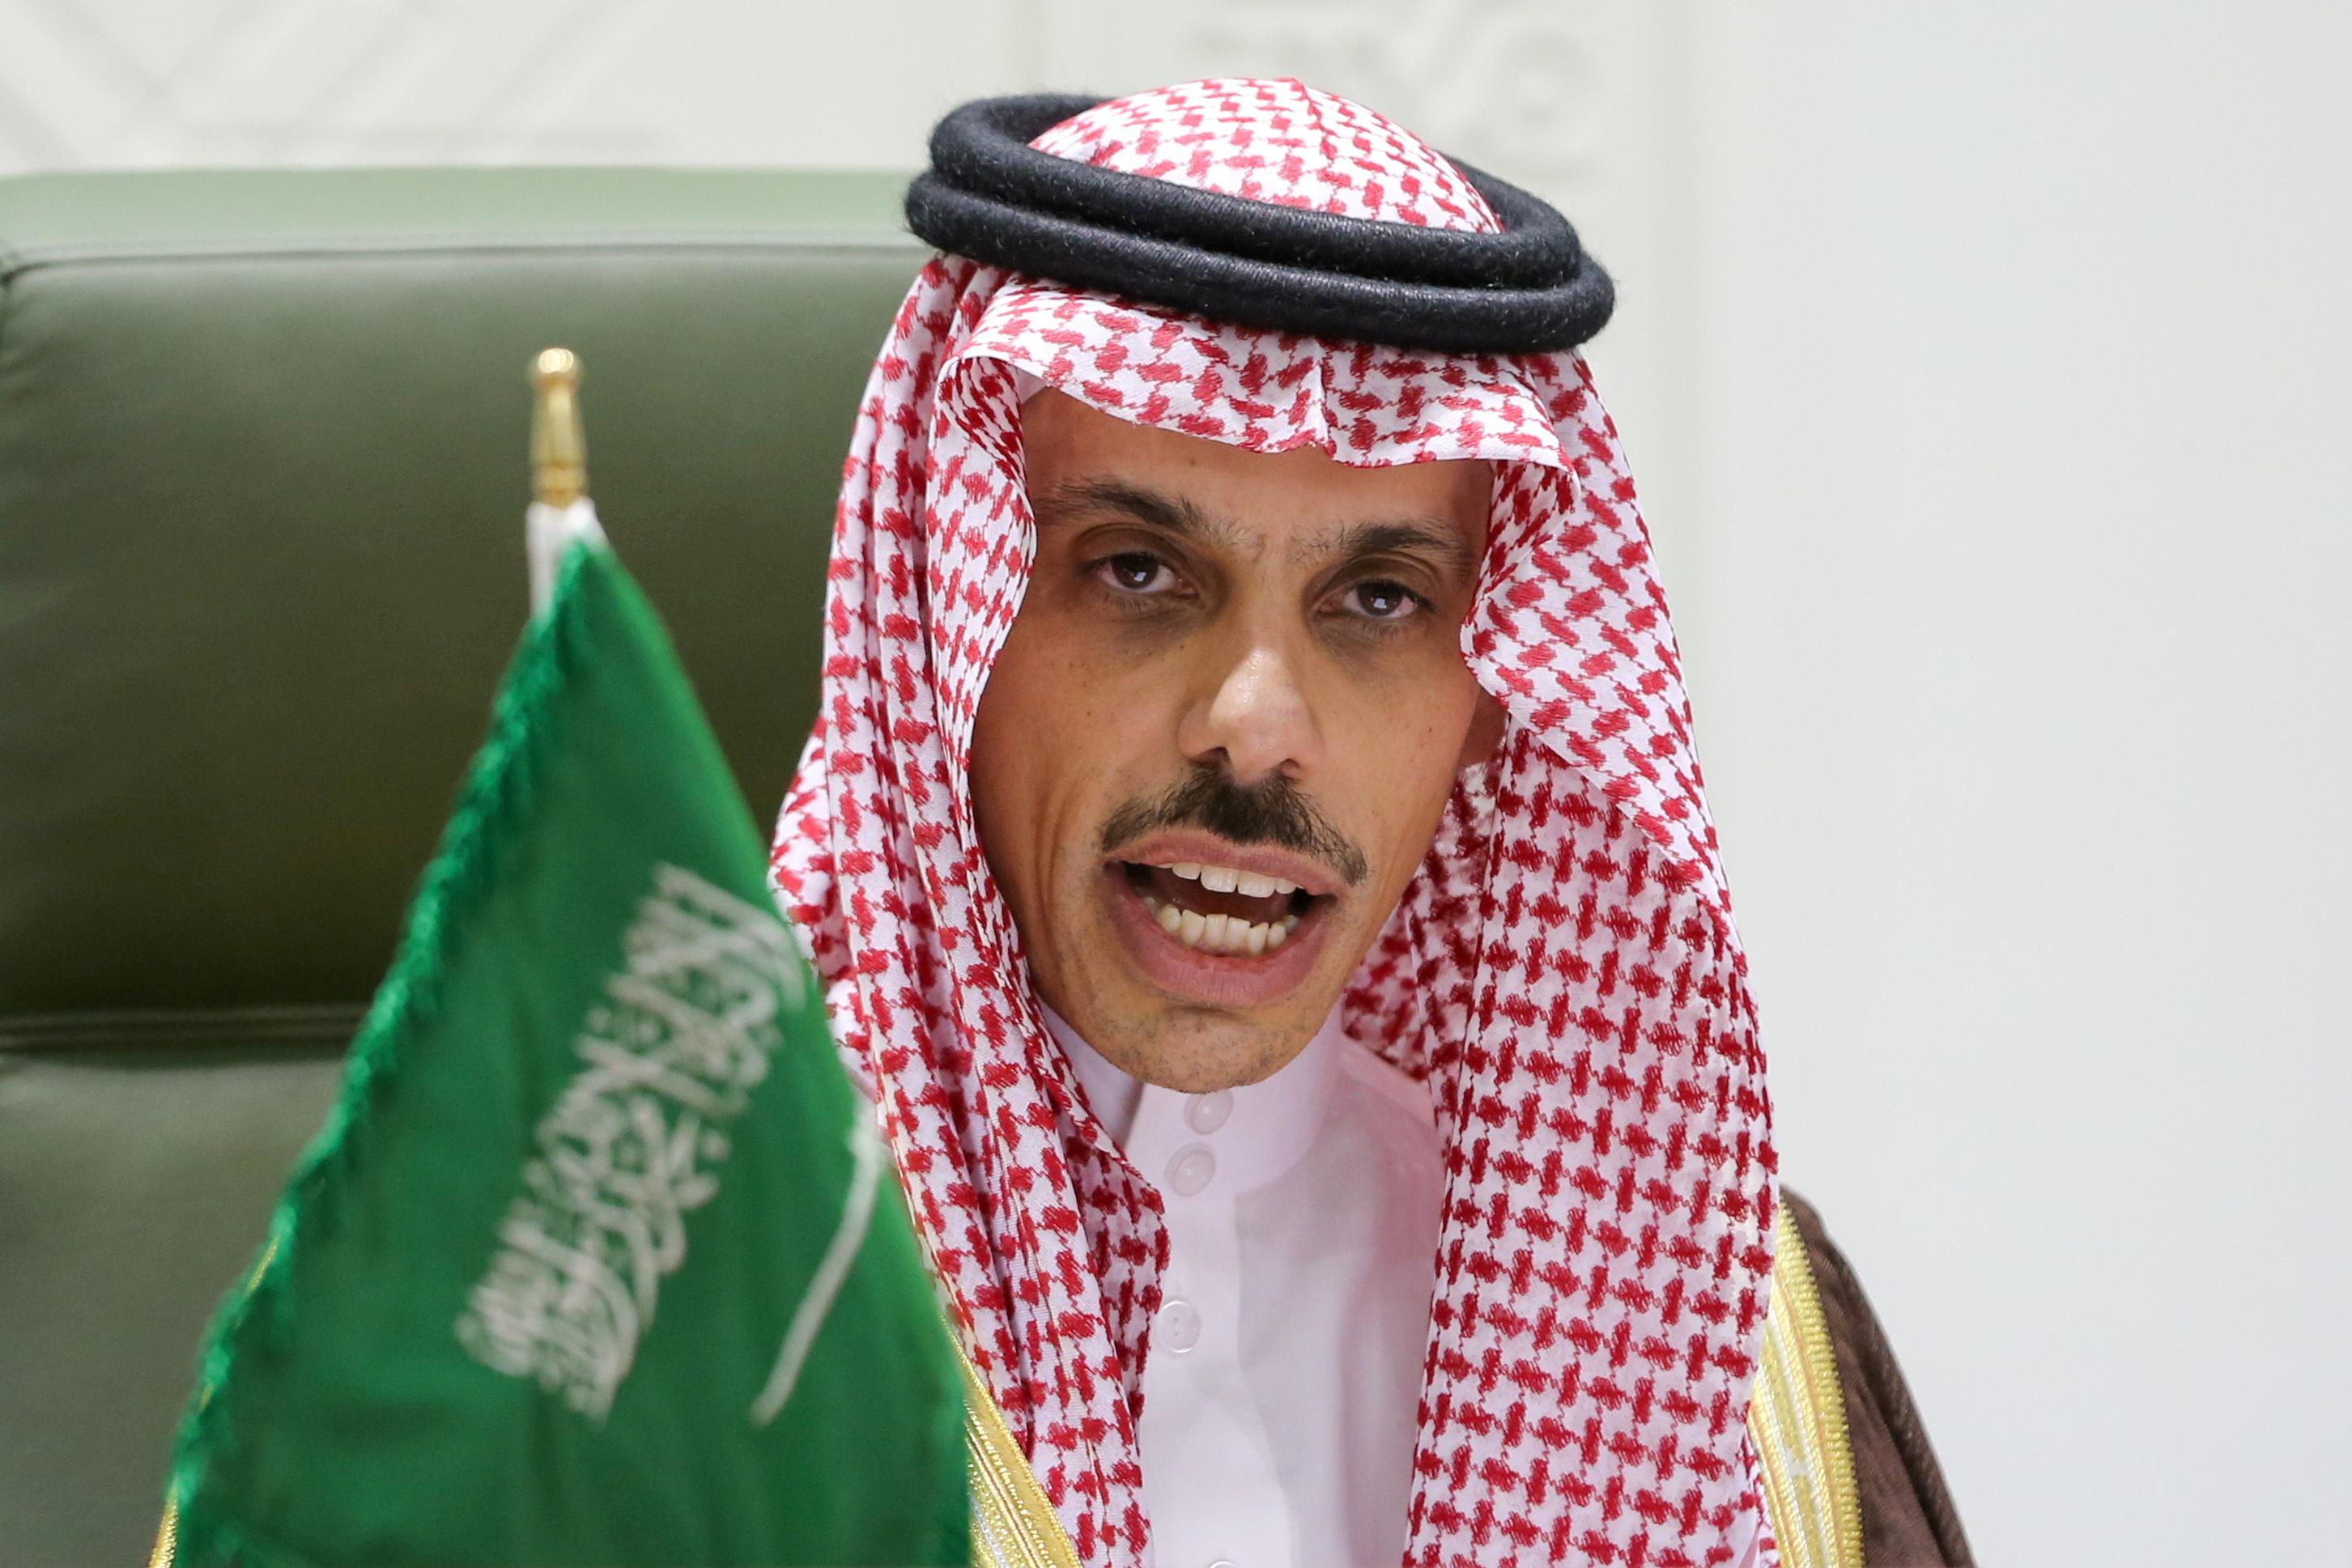 Saudi Arabia's Foreign Minister Prince Faisal bin Farhan Al Saud speaks during a news conference in Riyadh, Saudi Arabia March 22, 2021. REUTERS/Ahmed Yosri/File Photo